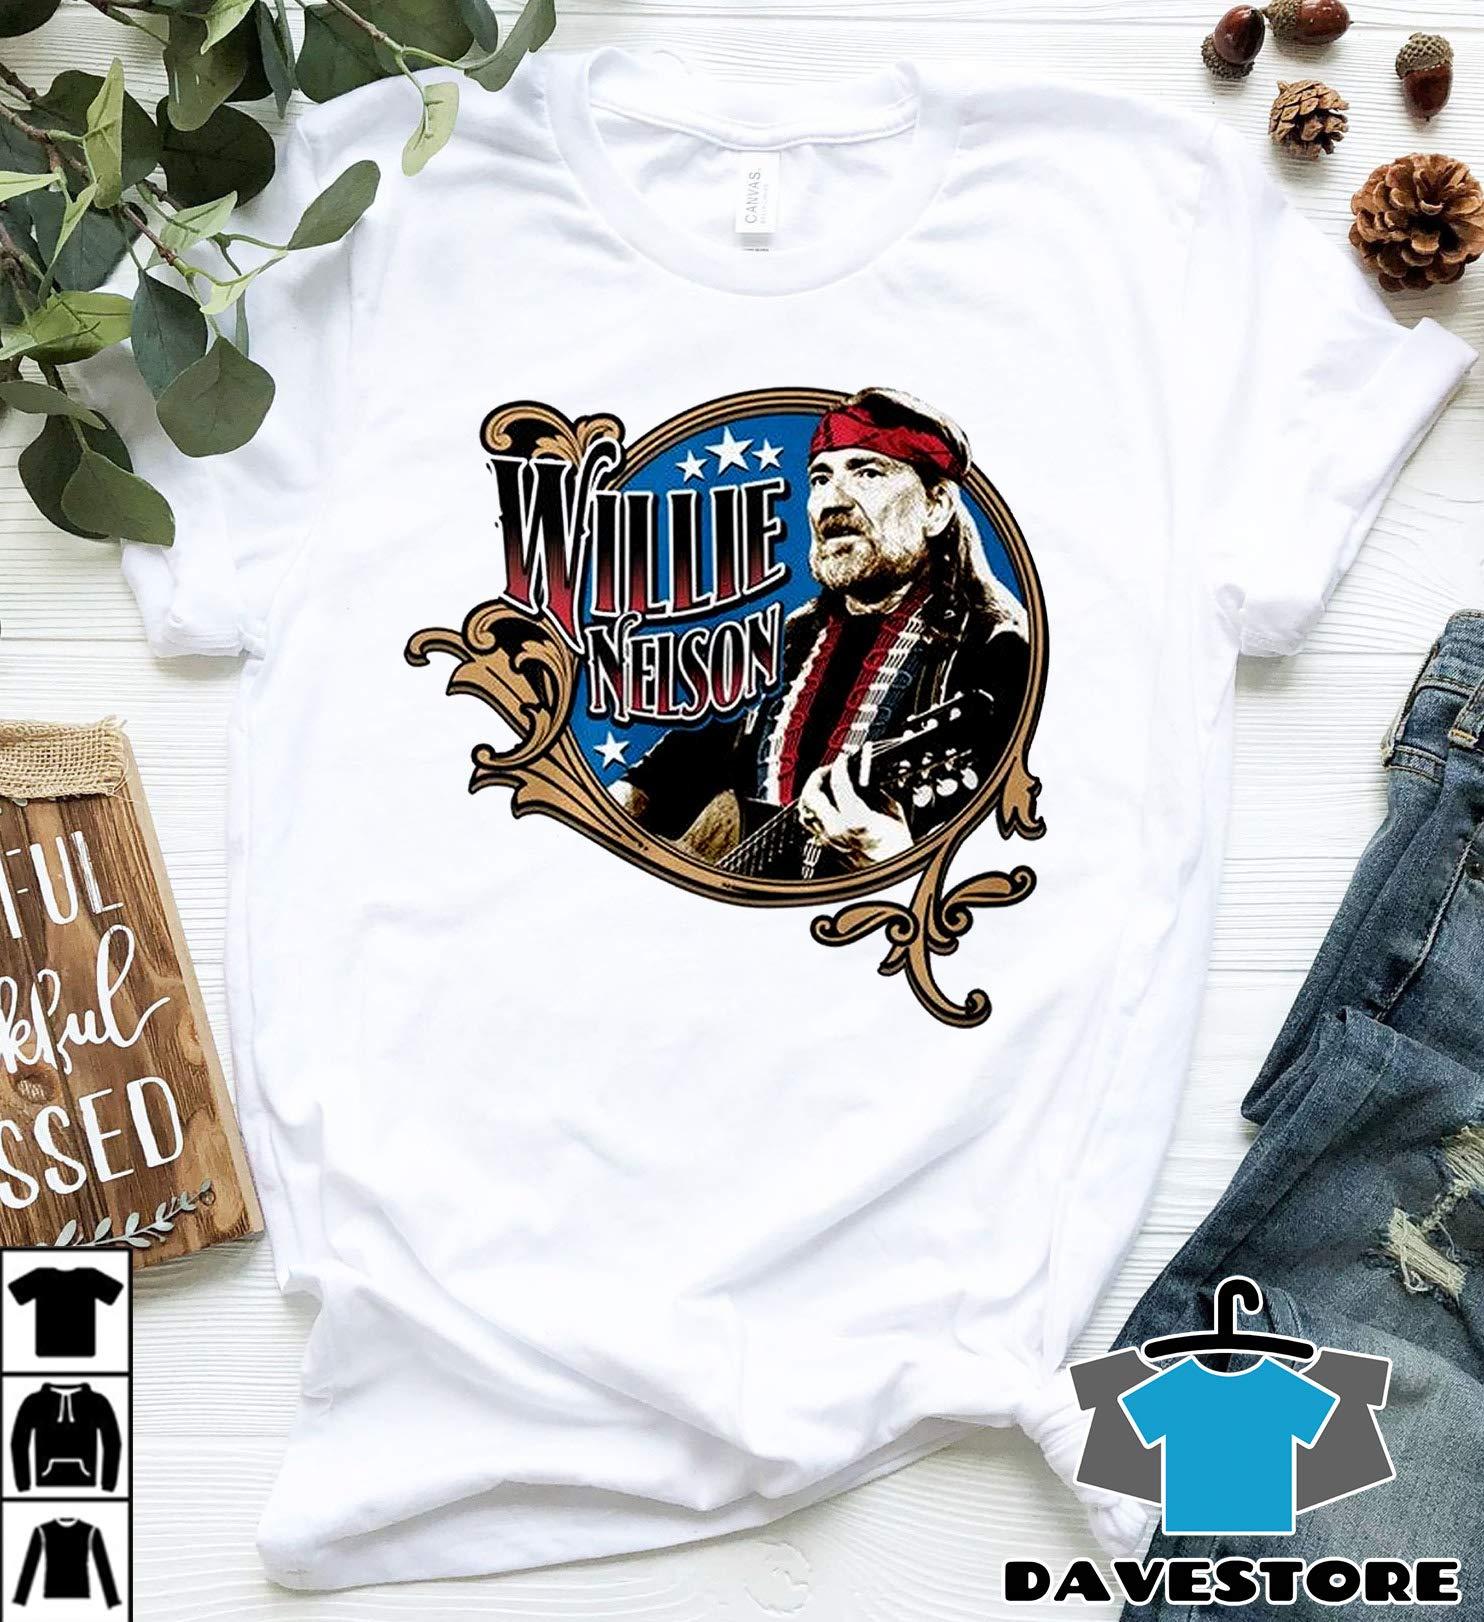 Willie Nelson Shirts